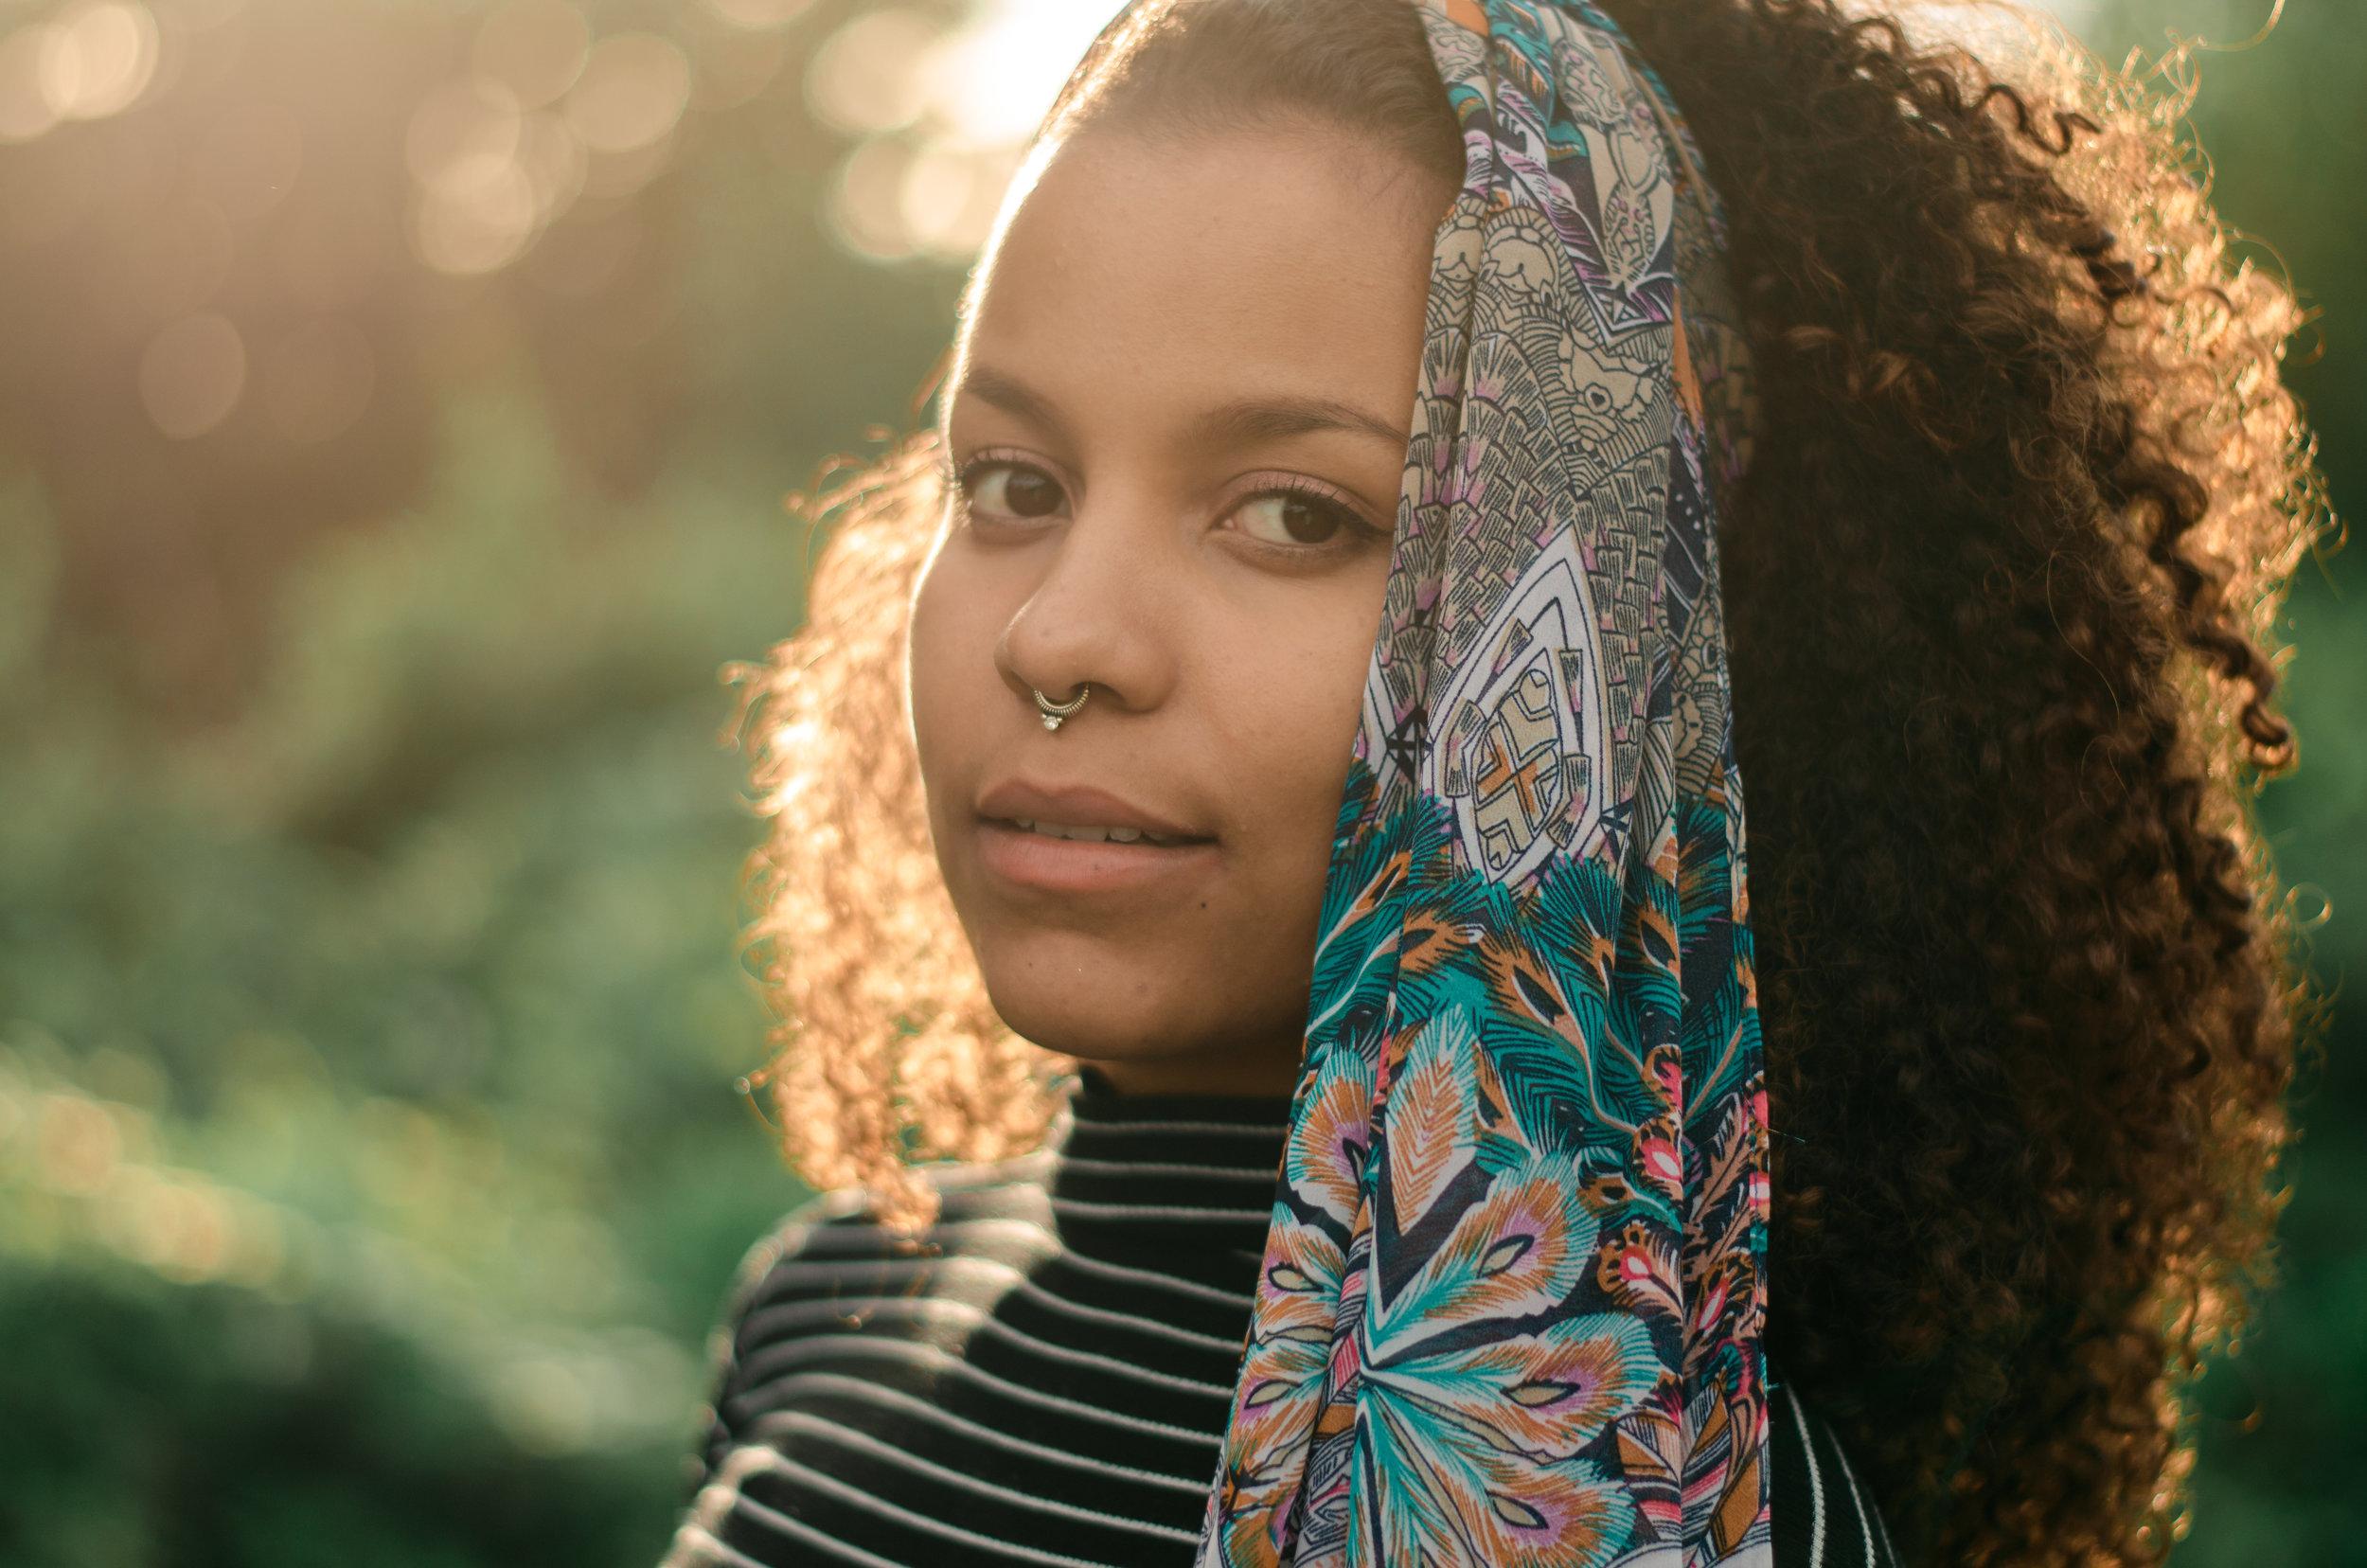 Inka-Portrait-Session-Aiste-Saulyte-Photography-17-07-30-254.jpg